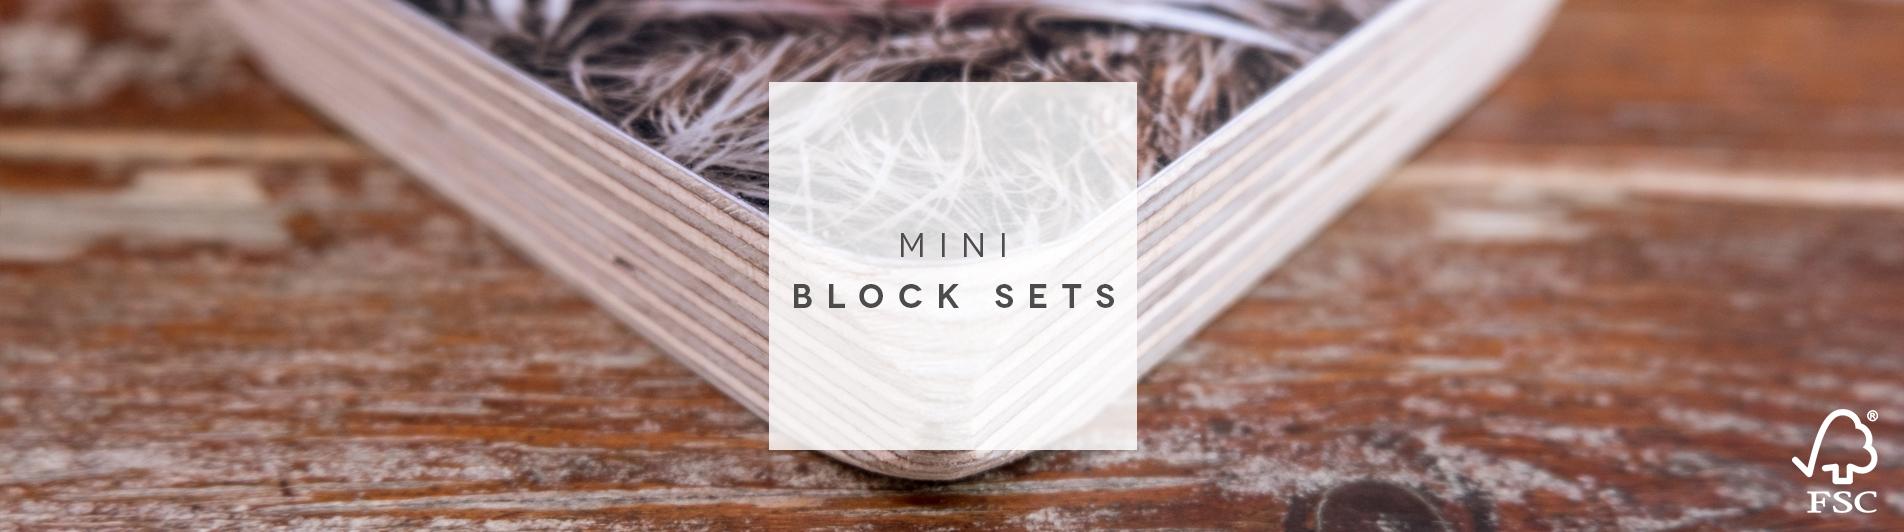 Mini Block Sets